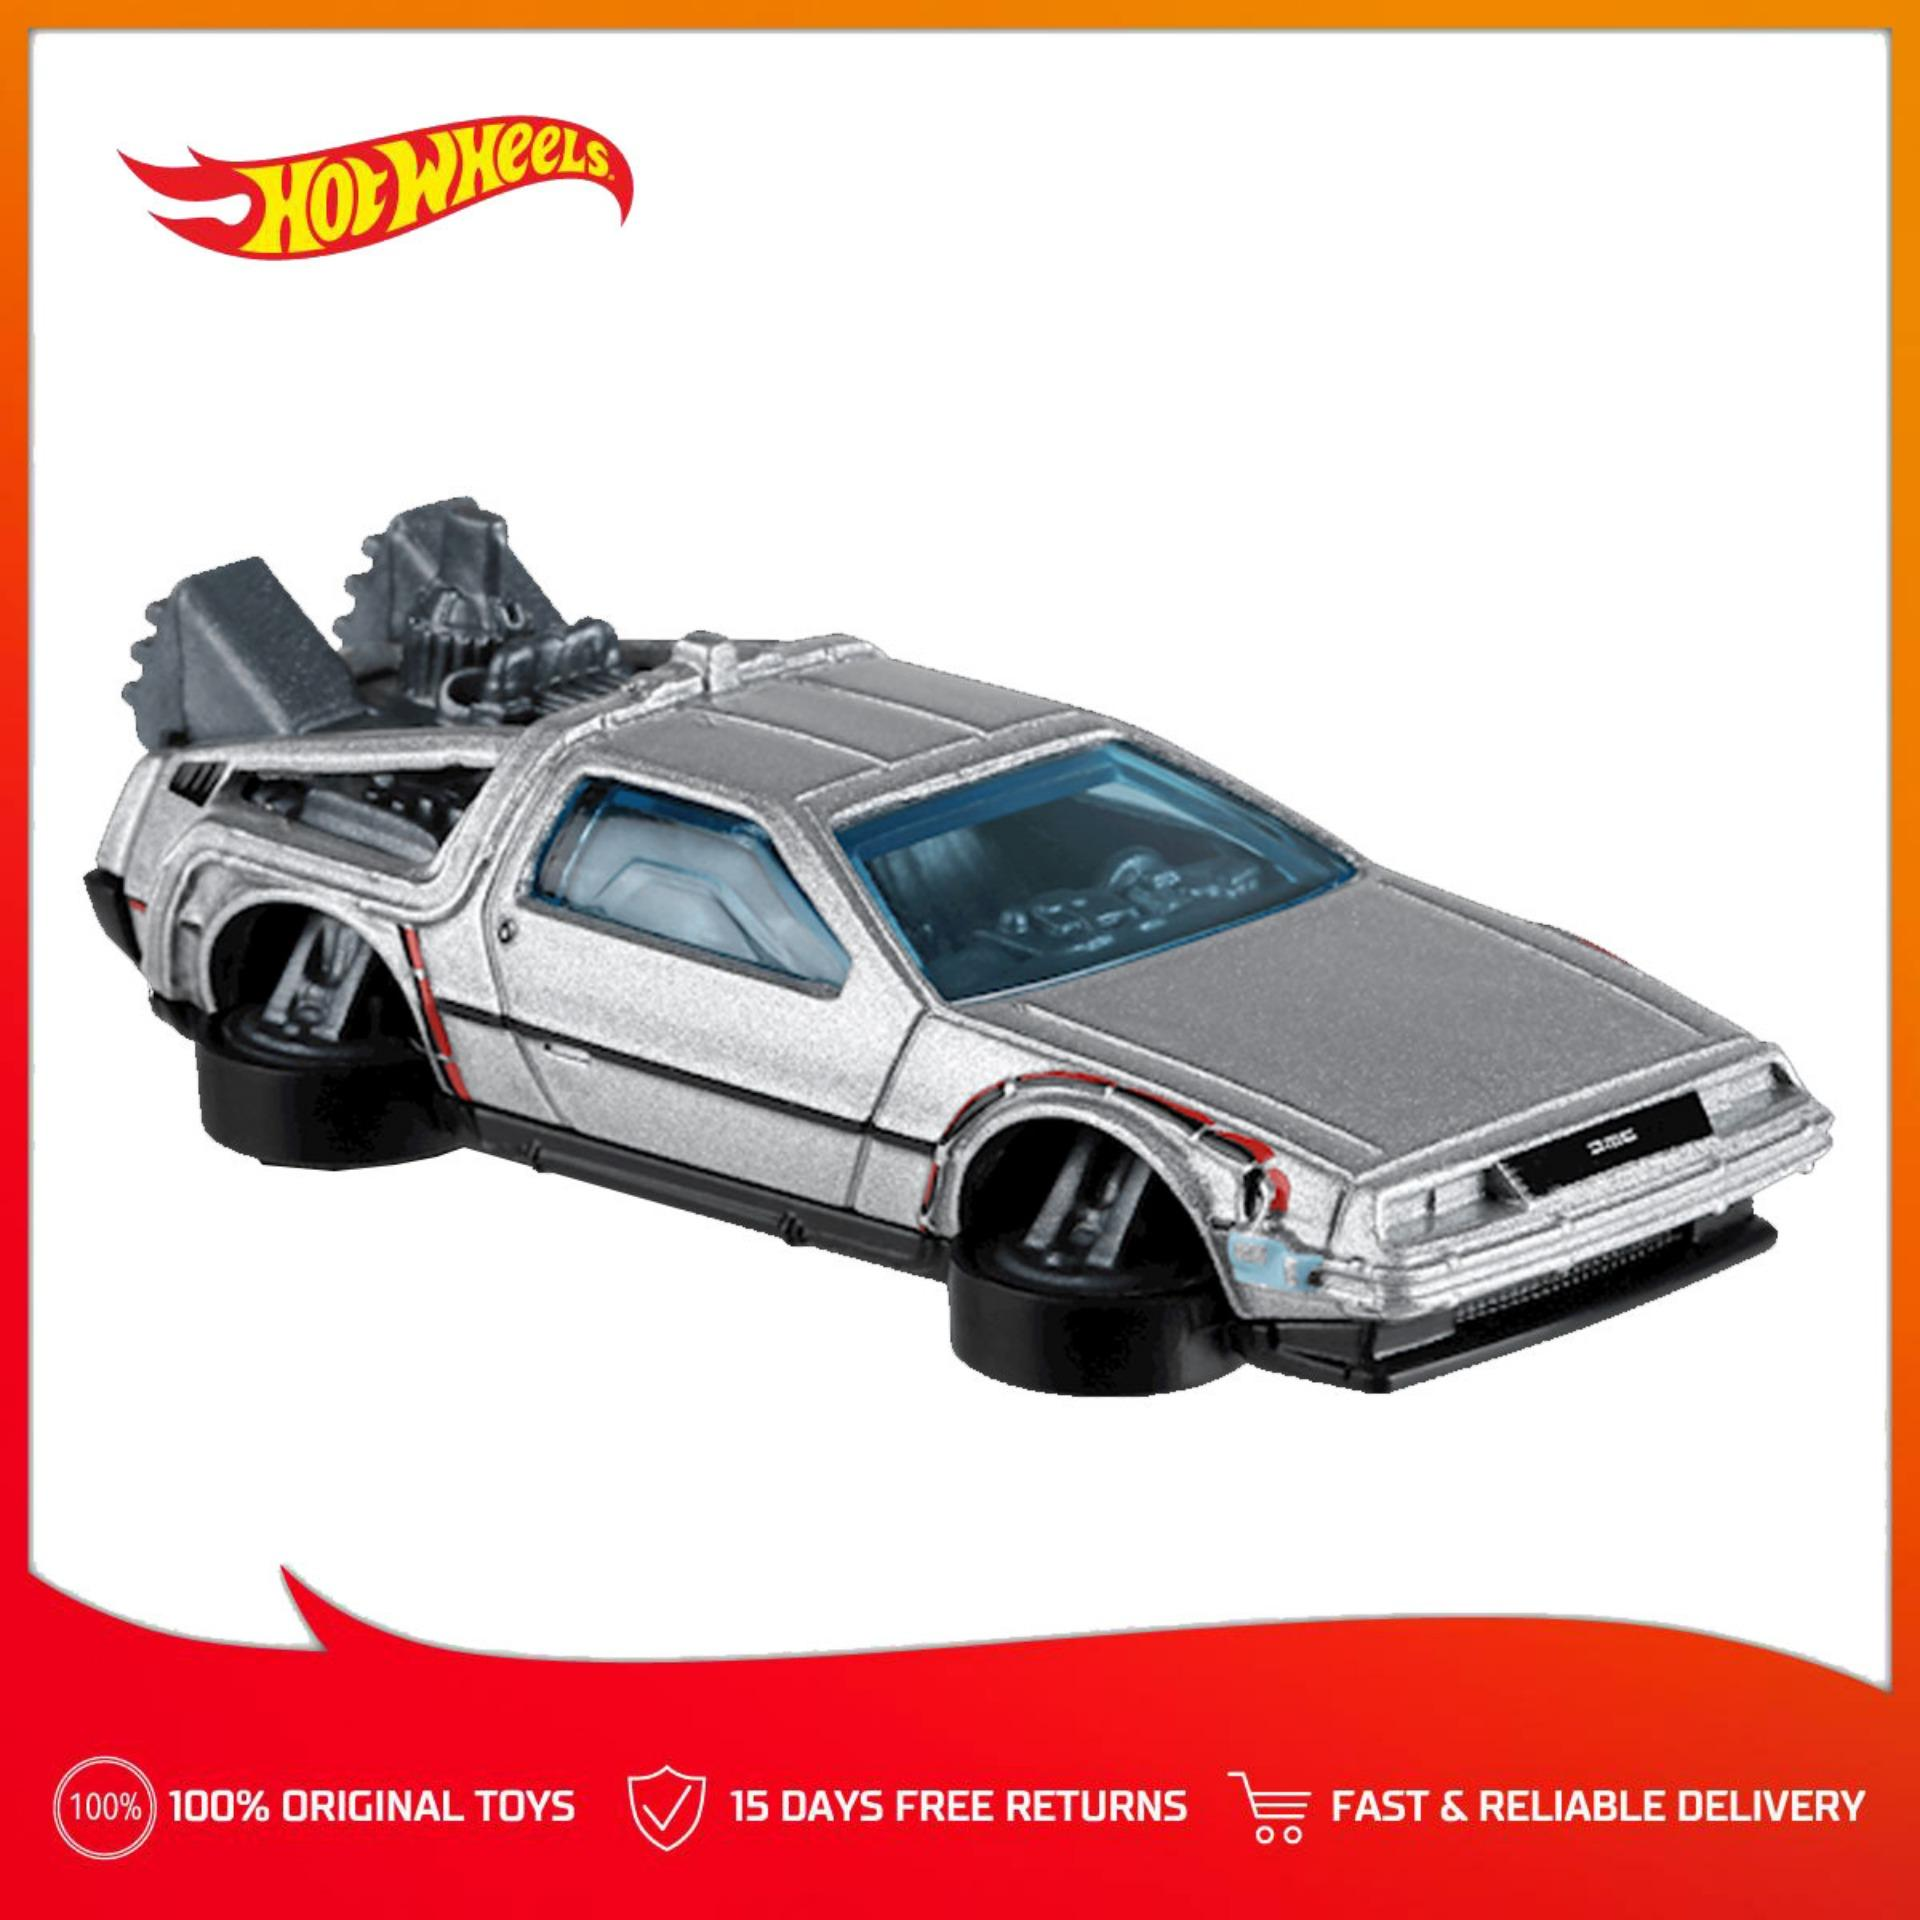 97f2a6618a Hot Wheels Basic Car 1 64 Scale DC  E - Back to the Future